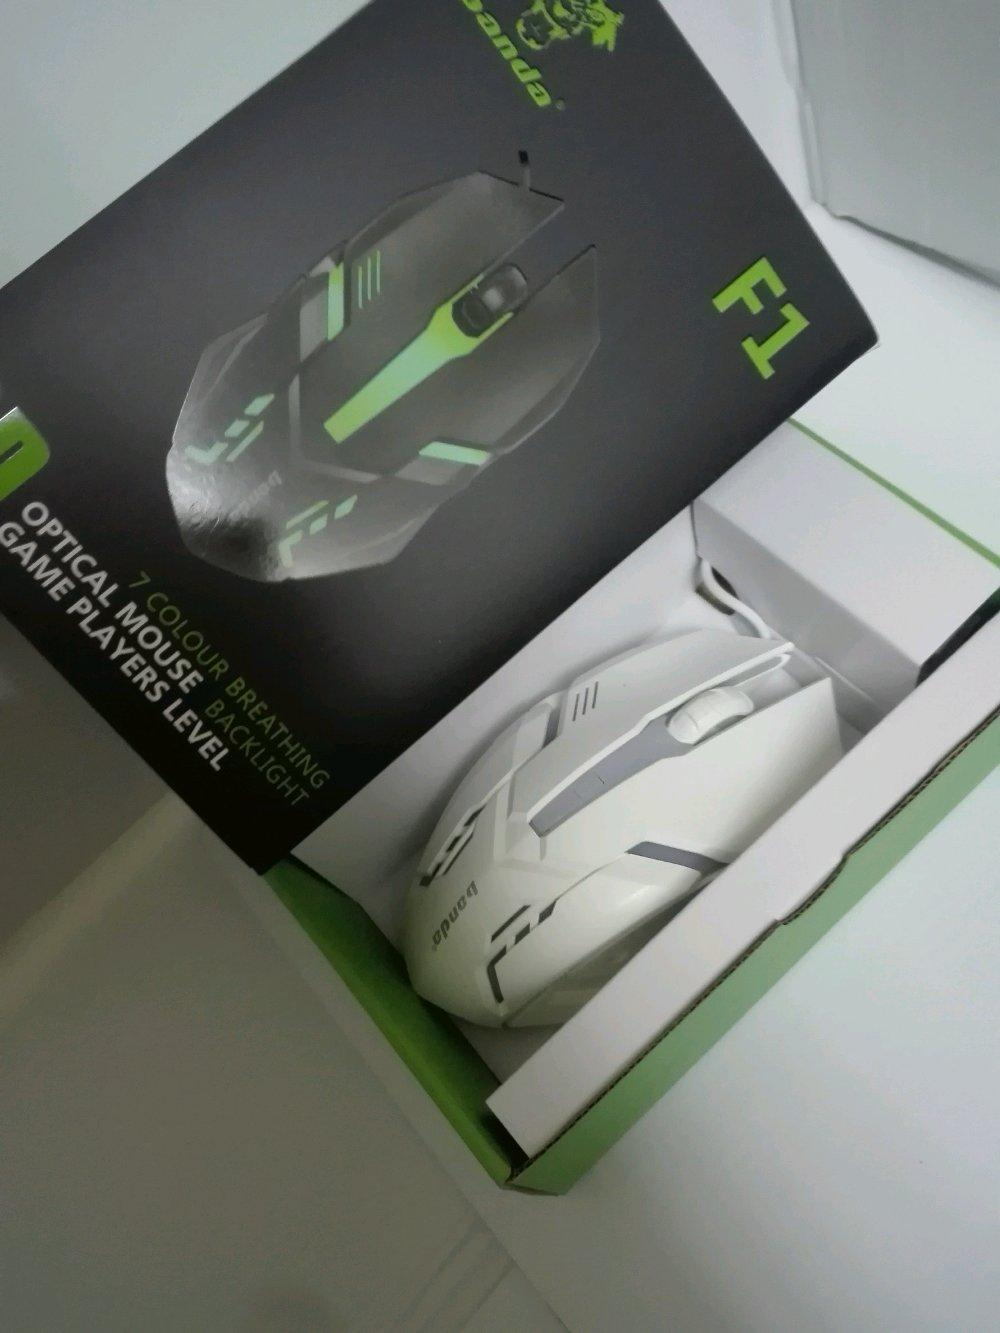 Fitur Hybridtech Mouse Gaming Banda F1 6d Optical Game Dan James Donkey 102 1600dpi Wireless Black 3